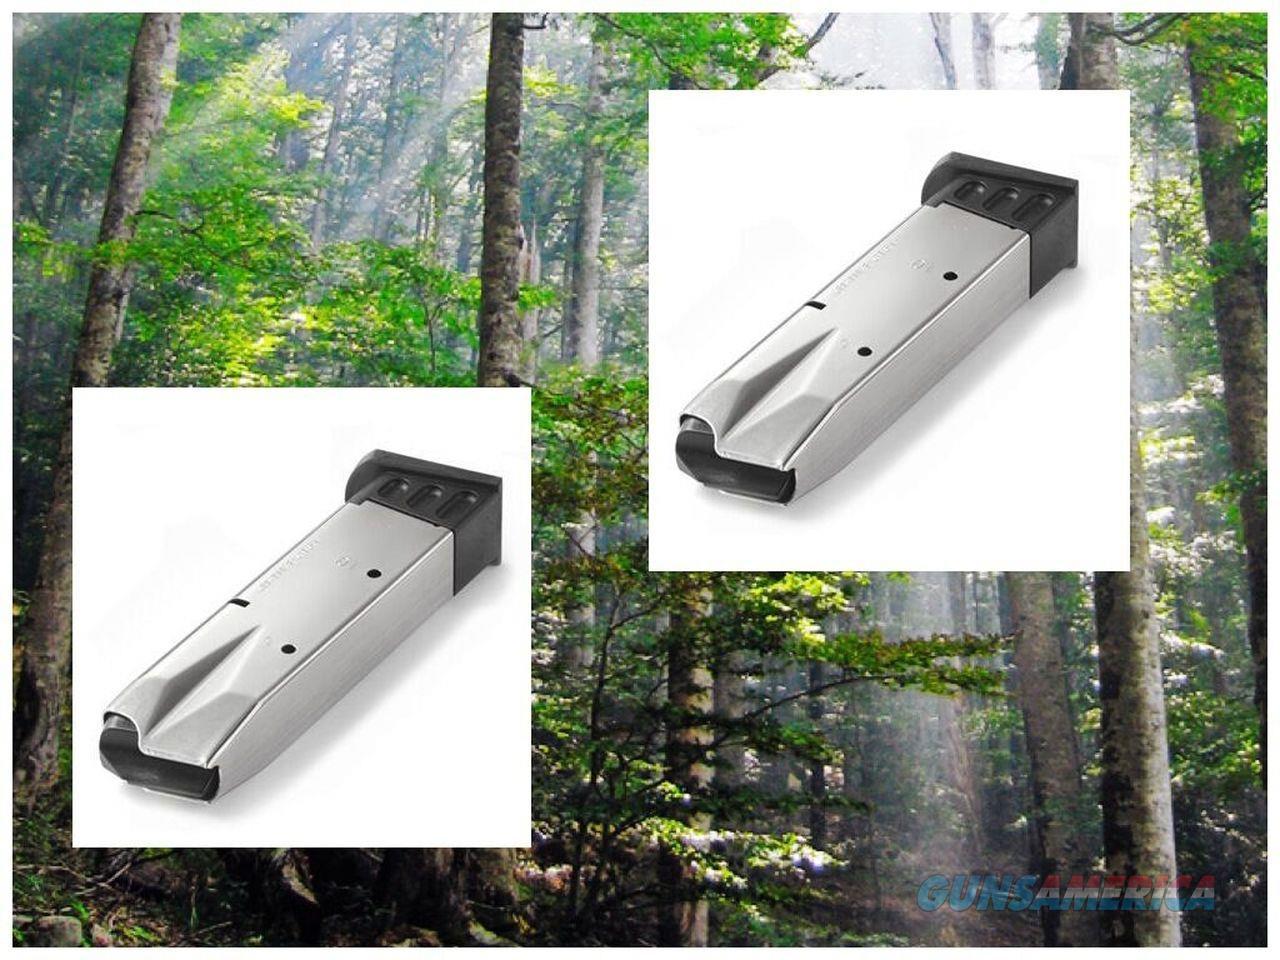 2-Pack TAURUS 92 & 99 GLOSS NICKEL 9mm w/ UPLULA! Pistol Mag 10 Round MECGAR  Non-Guns > Ammunition